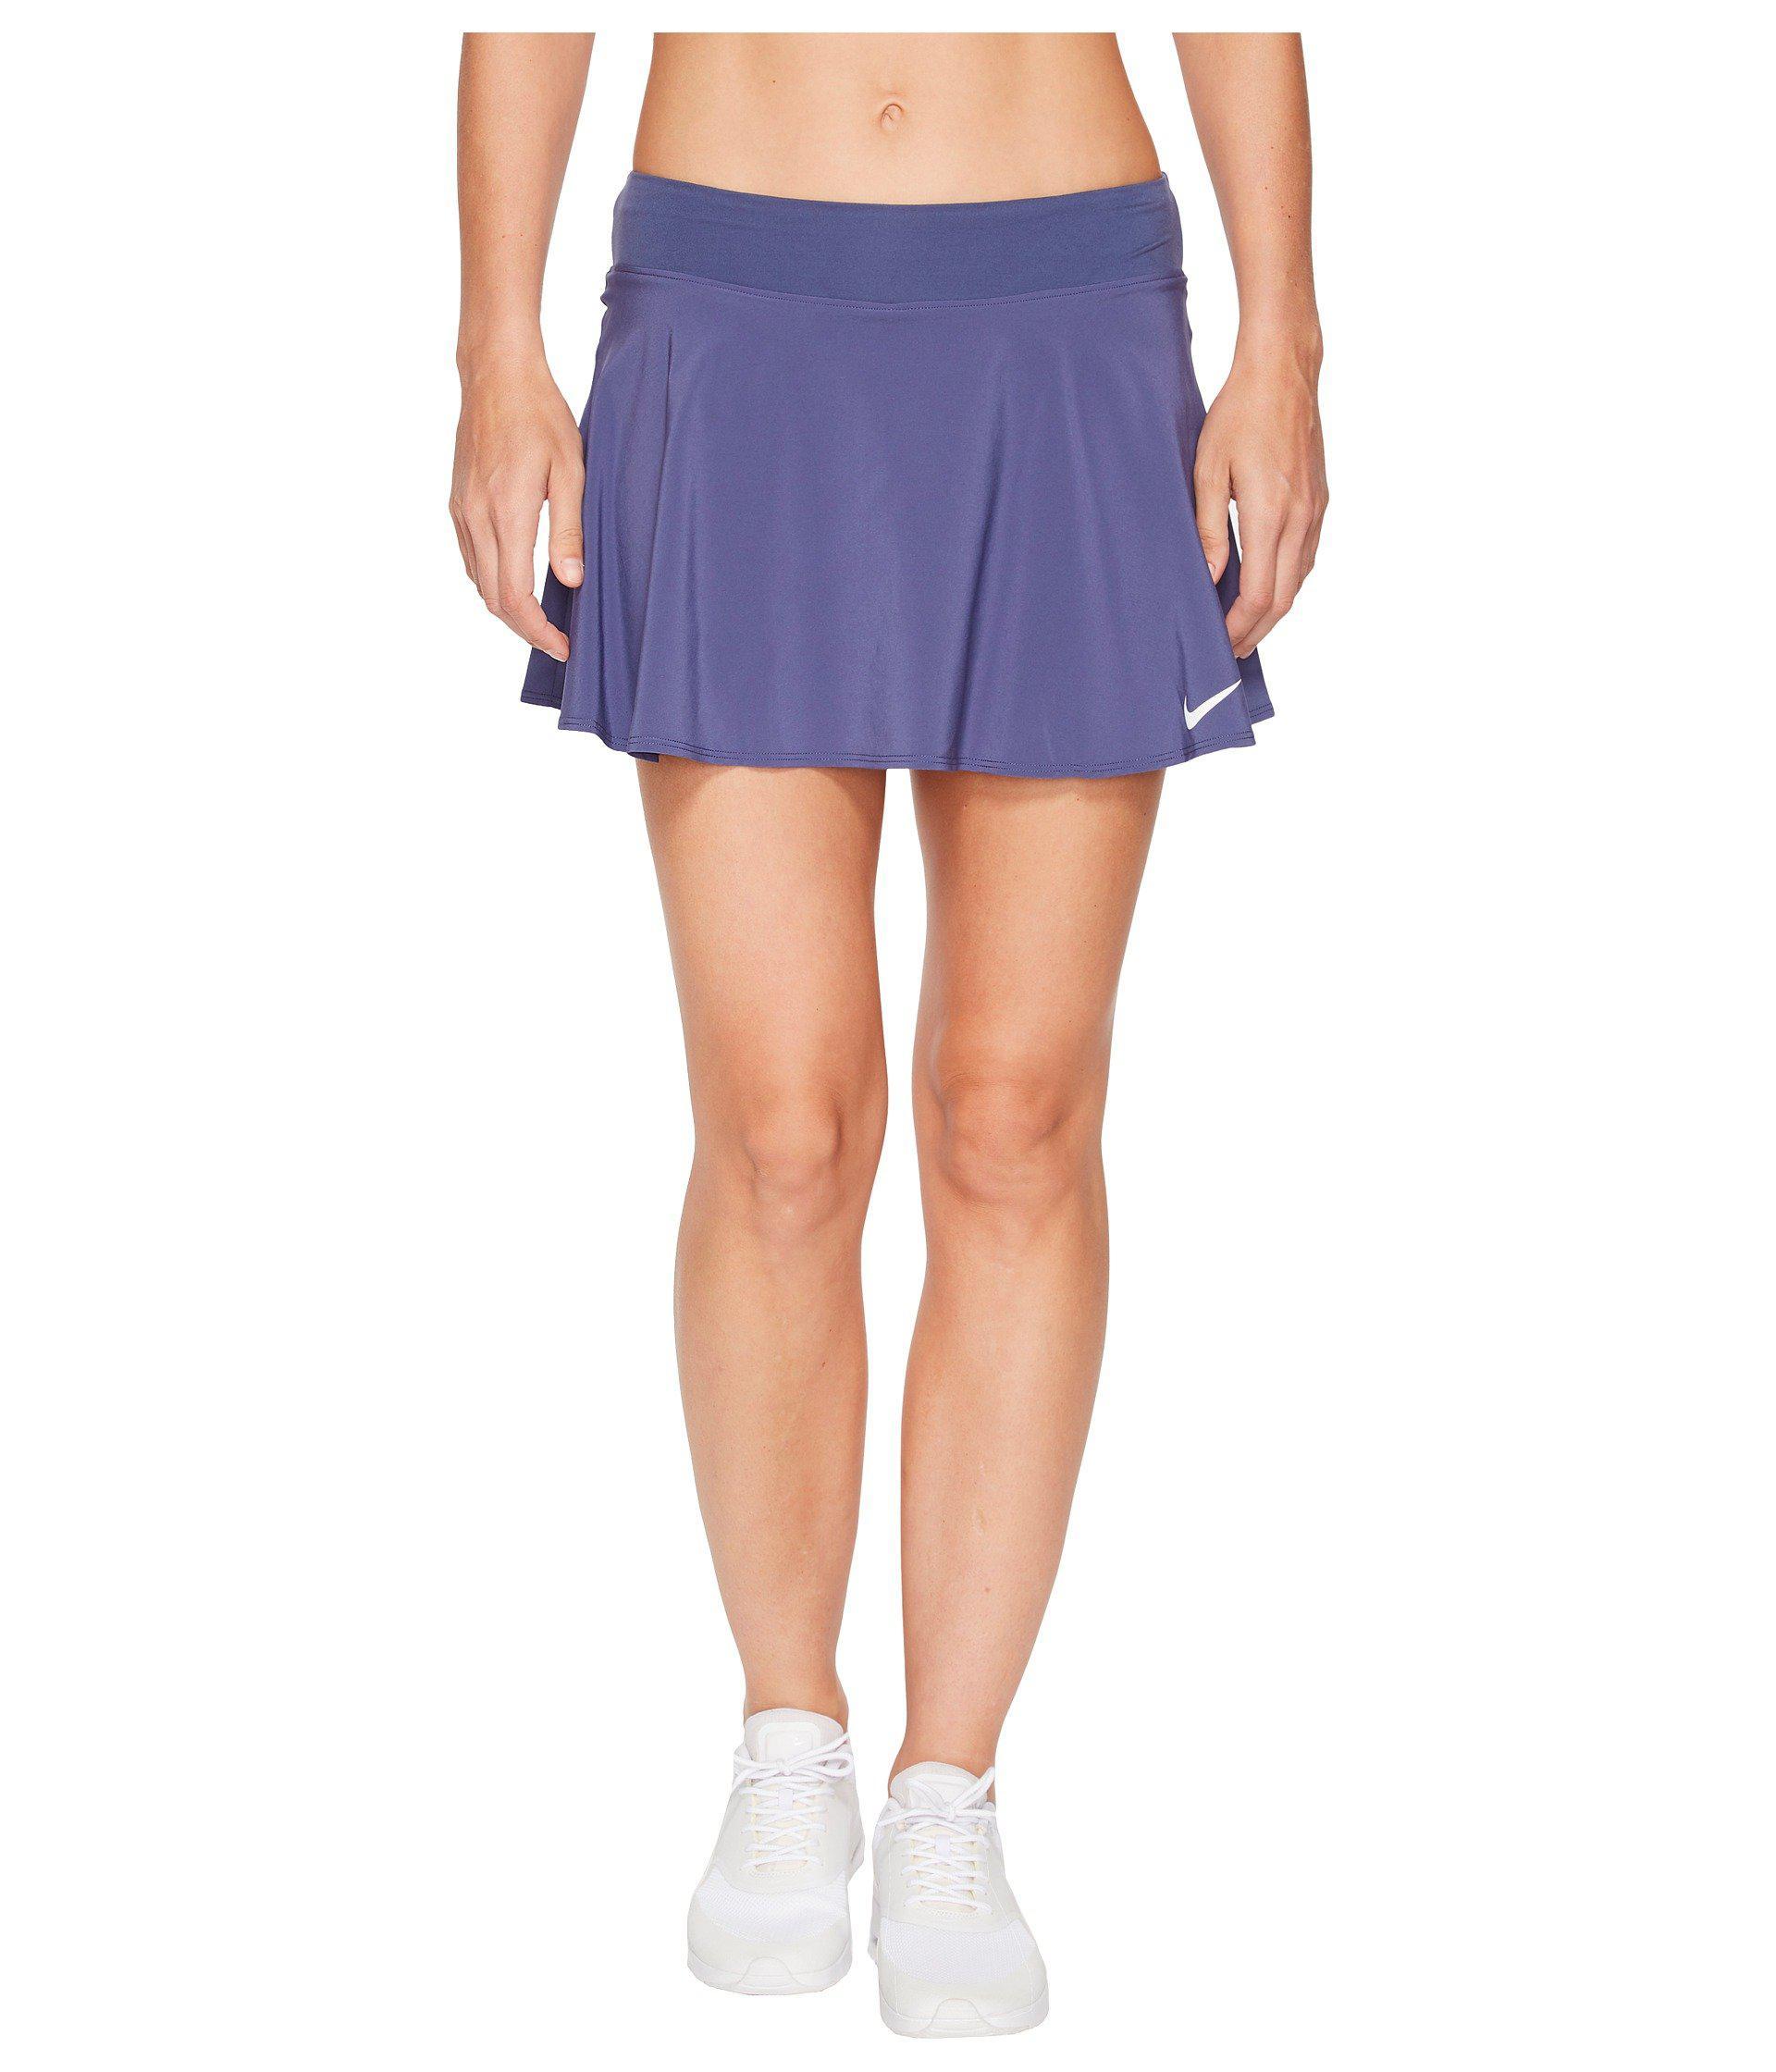 b94112d2e01 Lyst - Nike Court Flex Pure Tennis Skirt in Blue - Save 37%